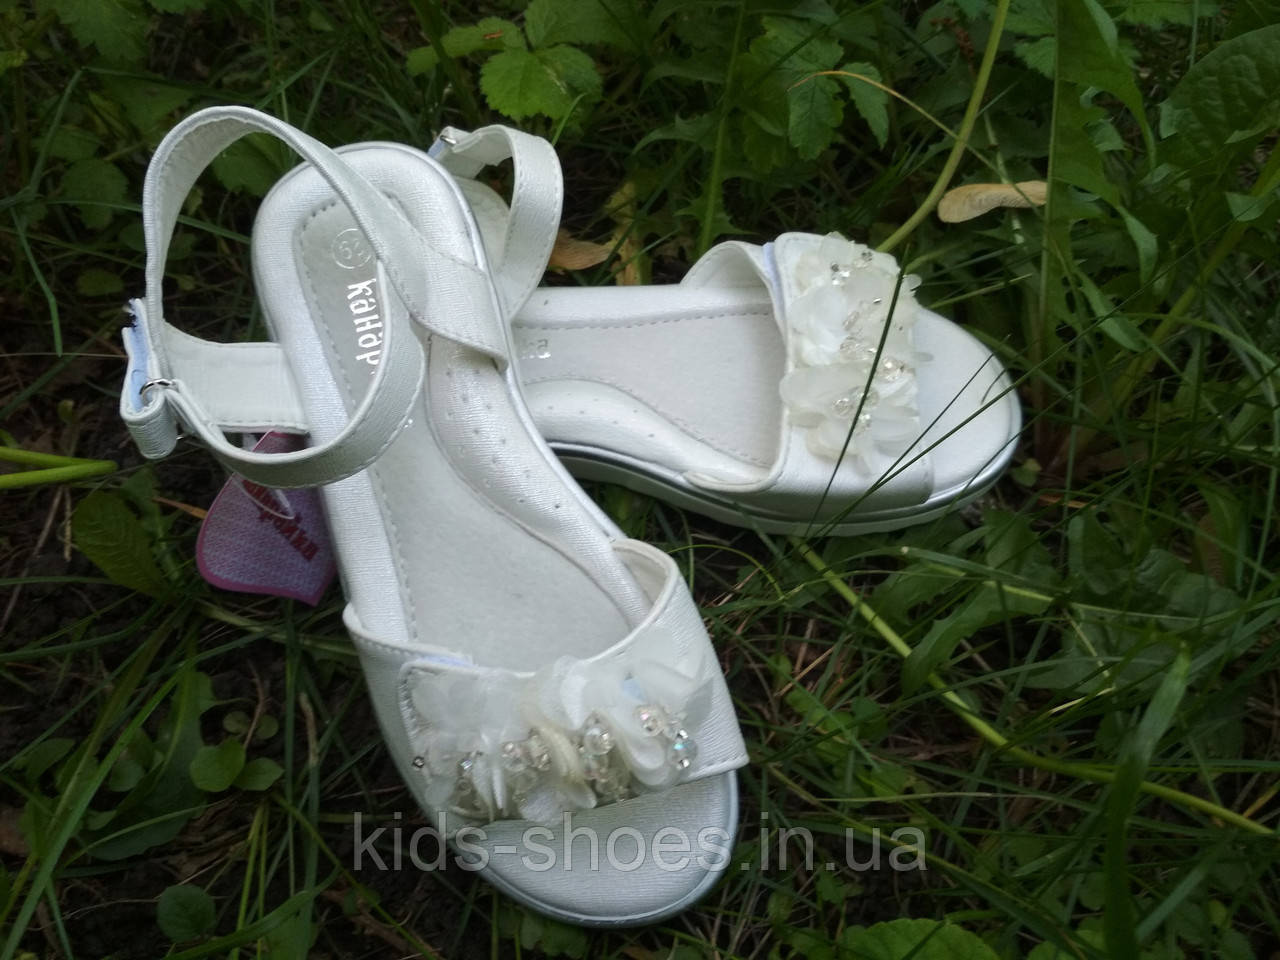 ccfdc51dc Детские босоножки Канарейка для девочки 32-19.5 - Интернет-магазин  «Kids-Shoes